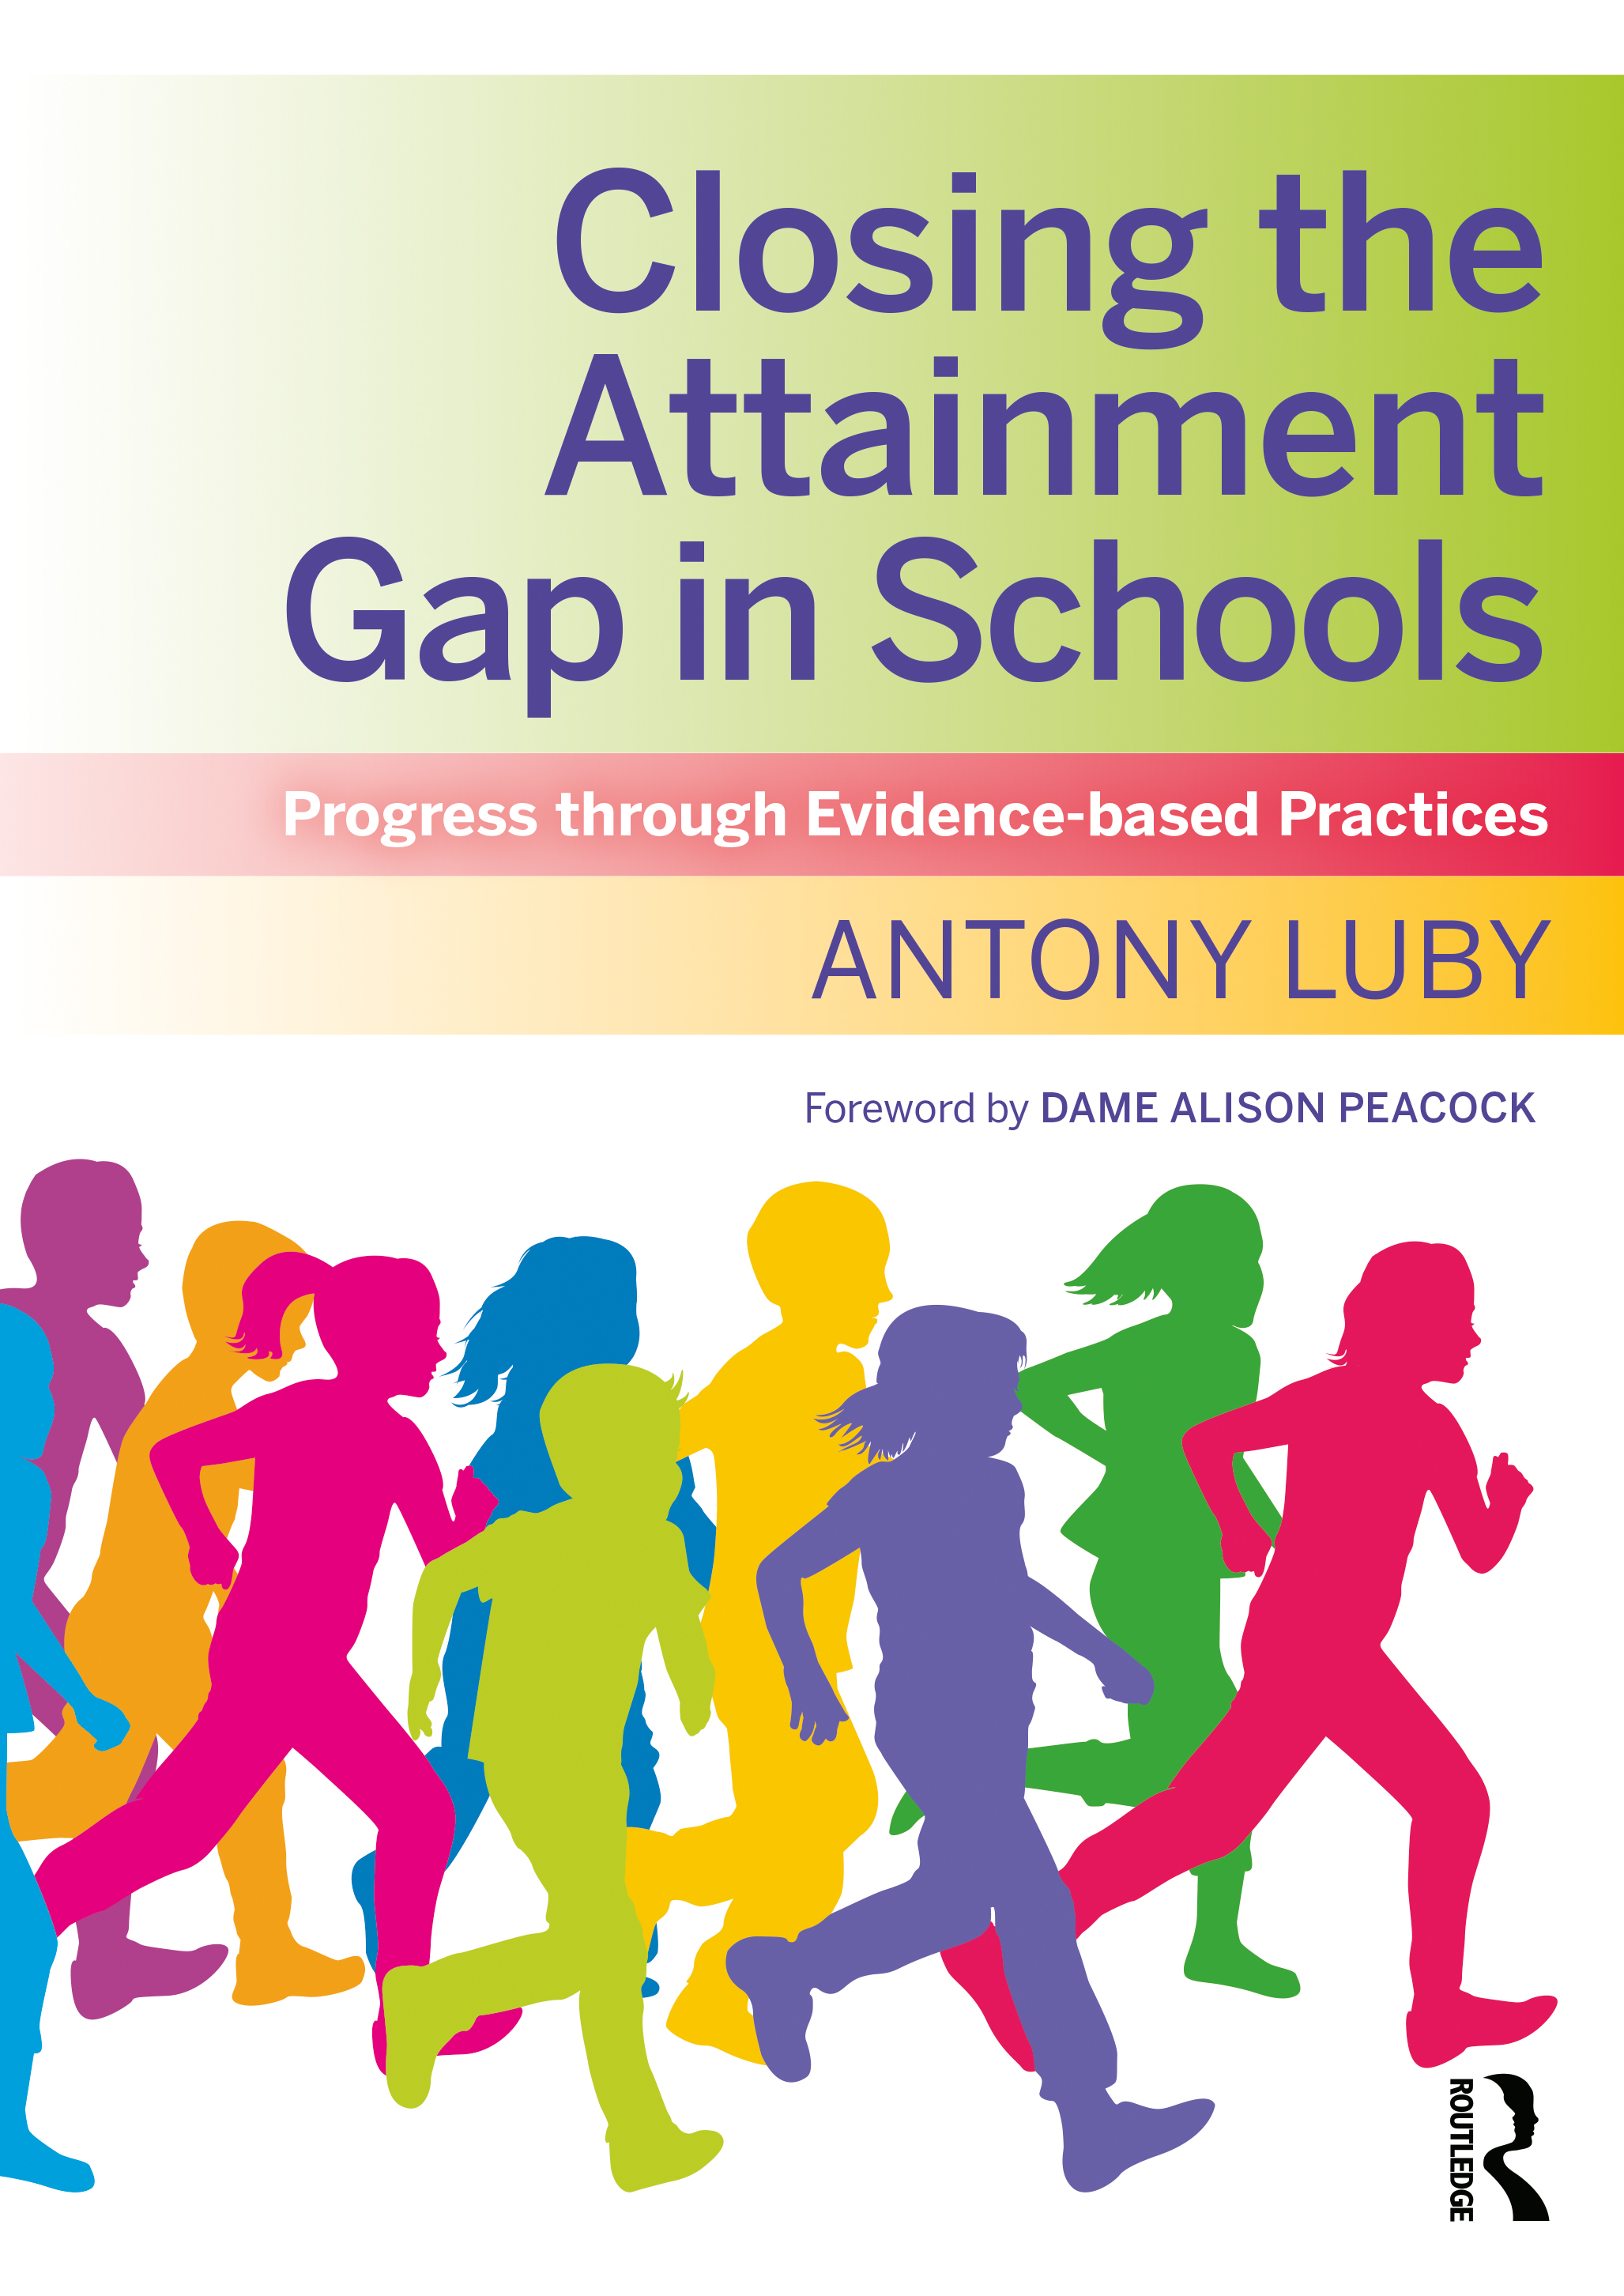 Closing the Attainment Gap in Schools